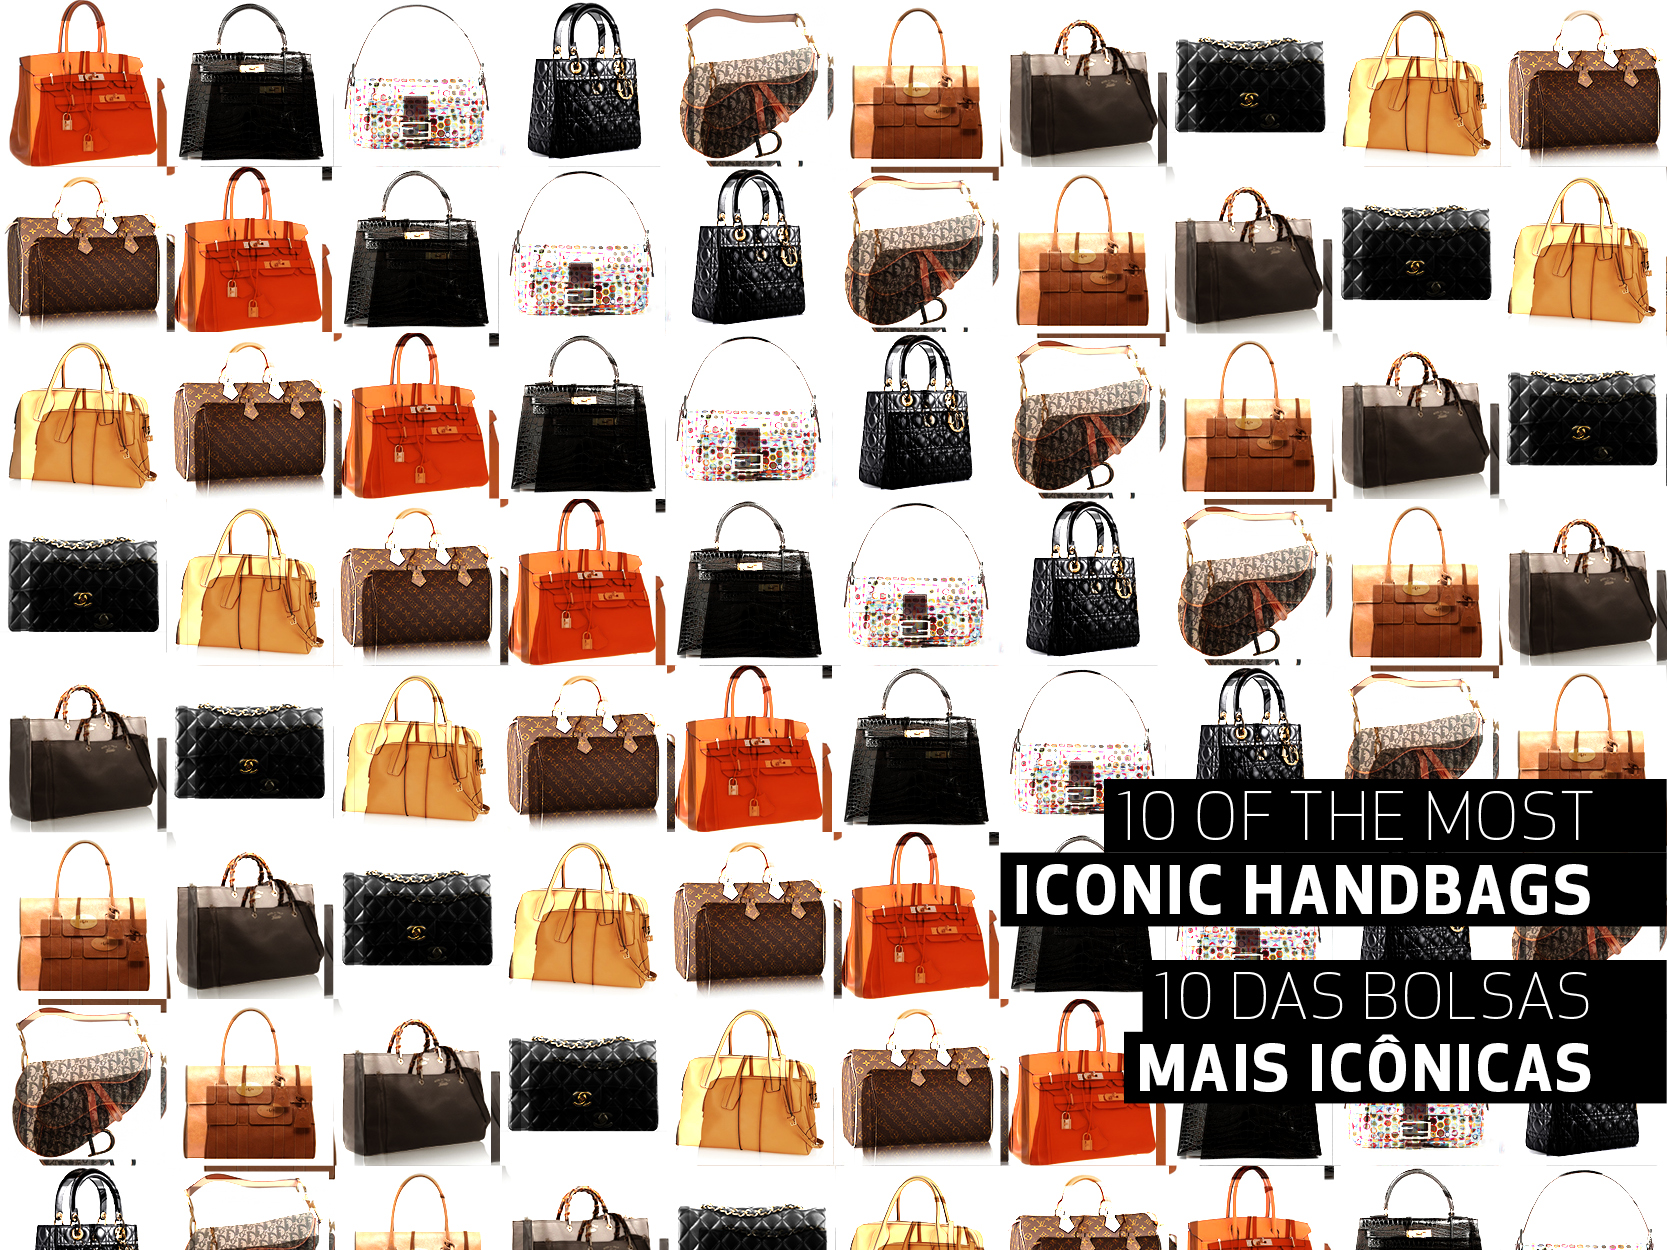 most iconic handbags